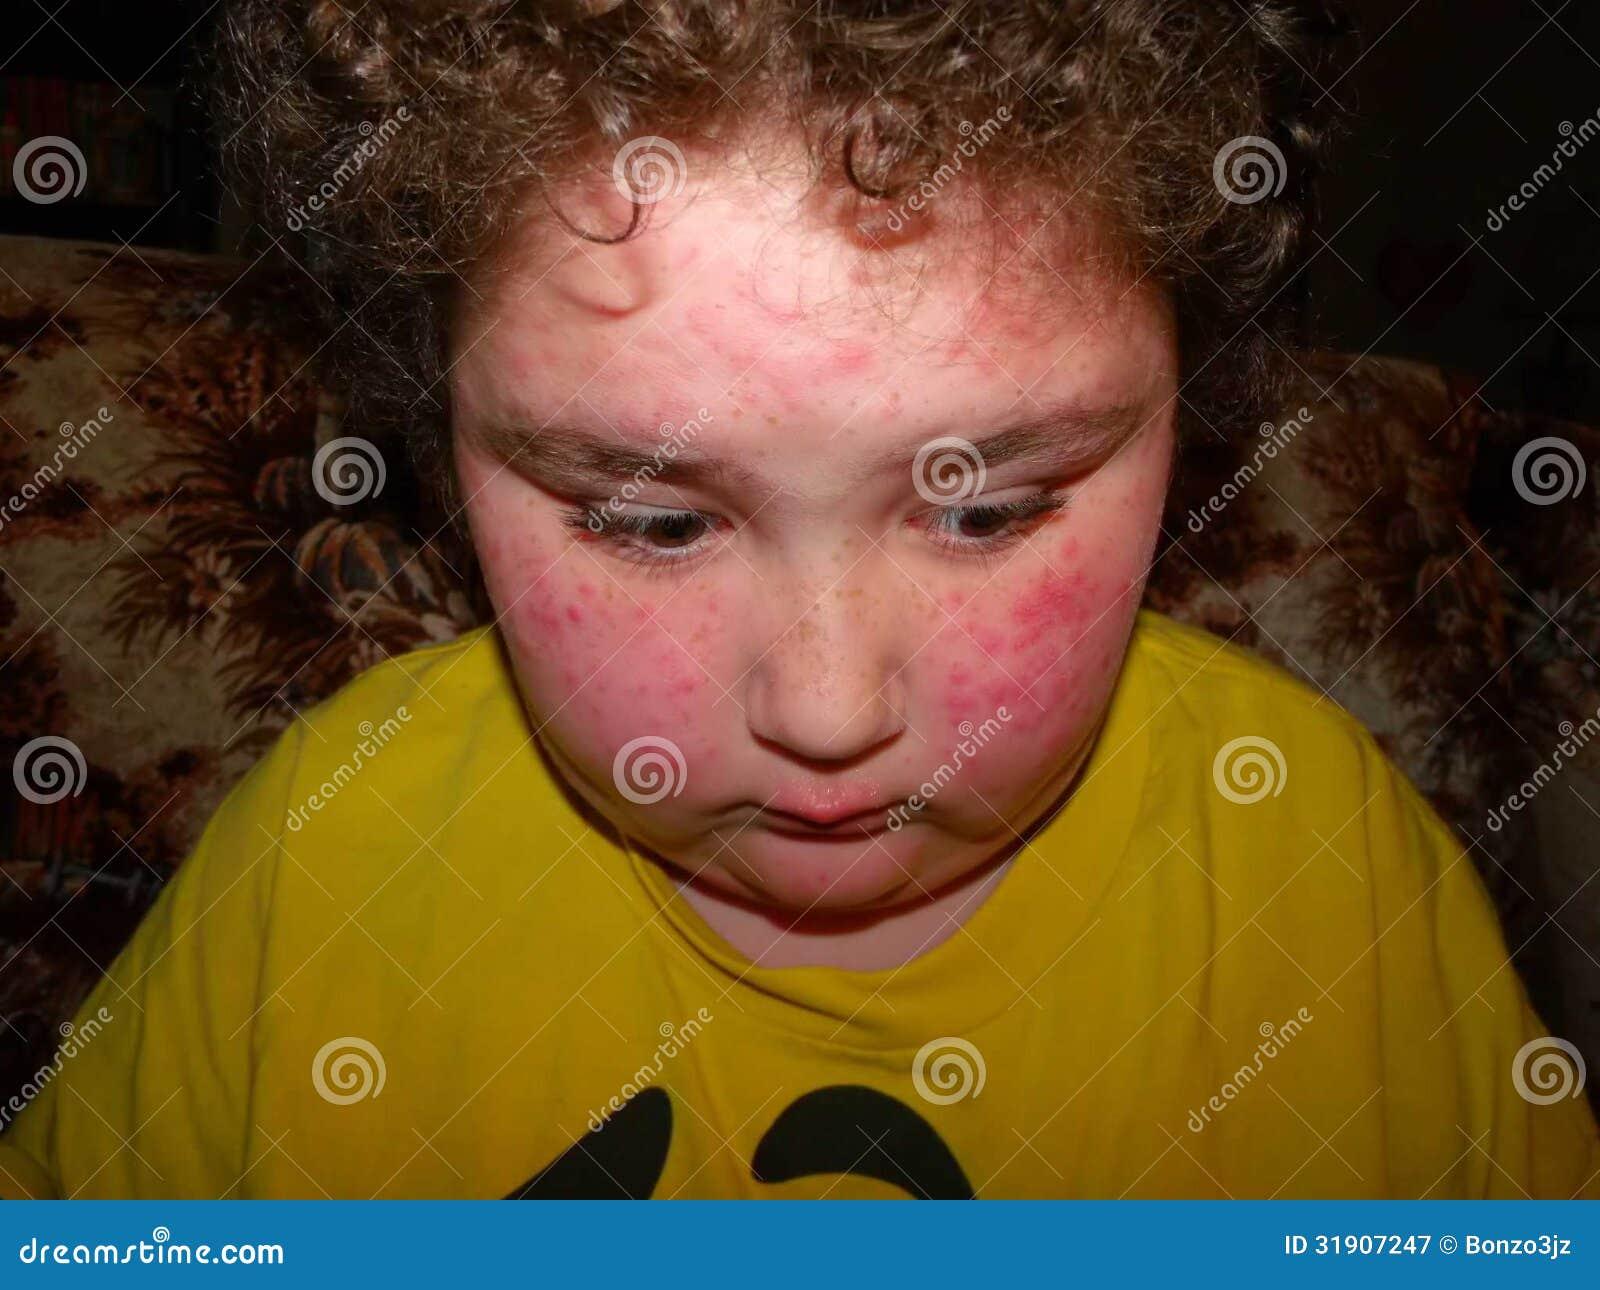 Alergiczna reakcja